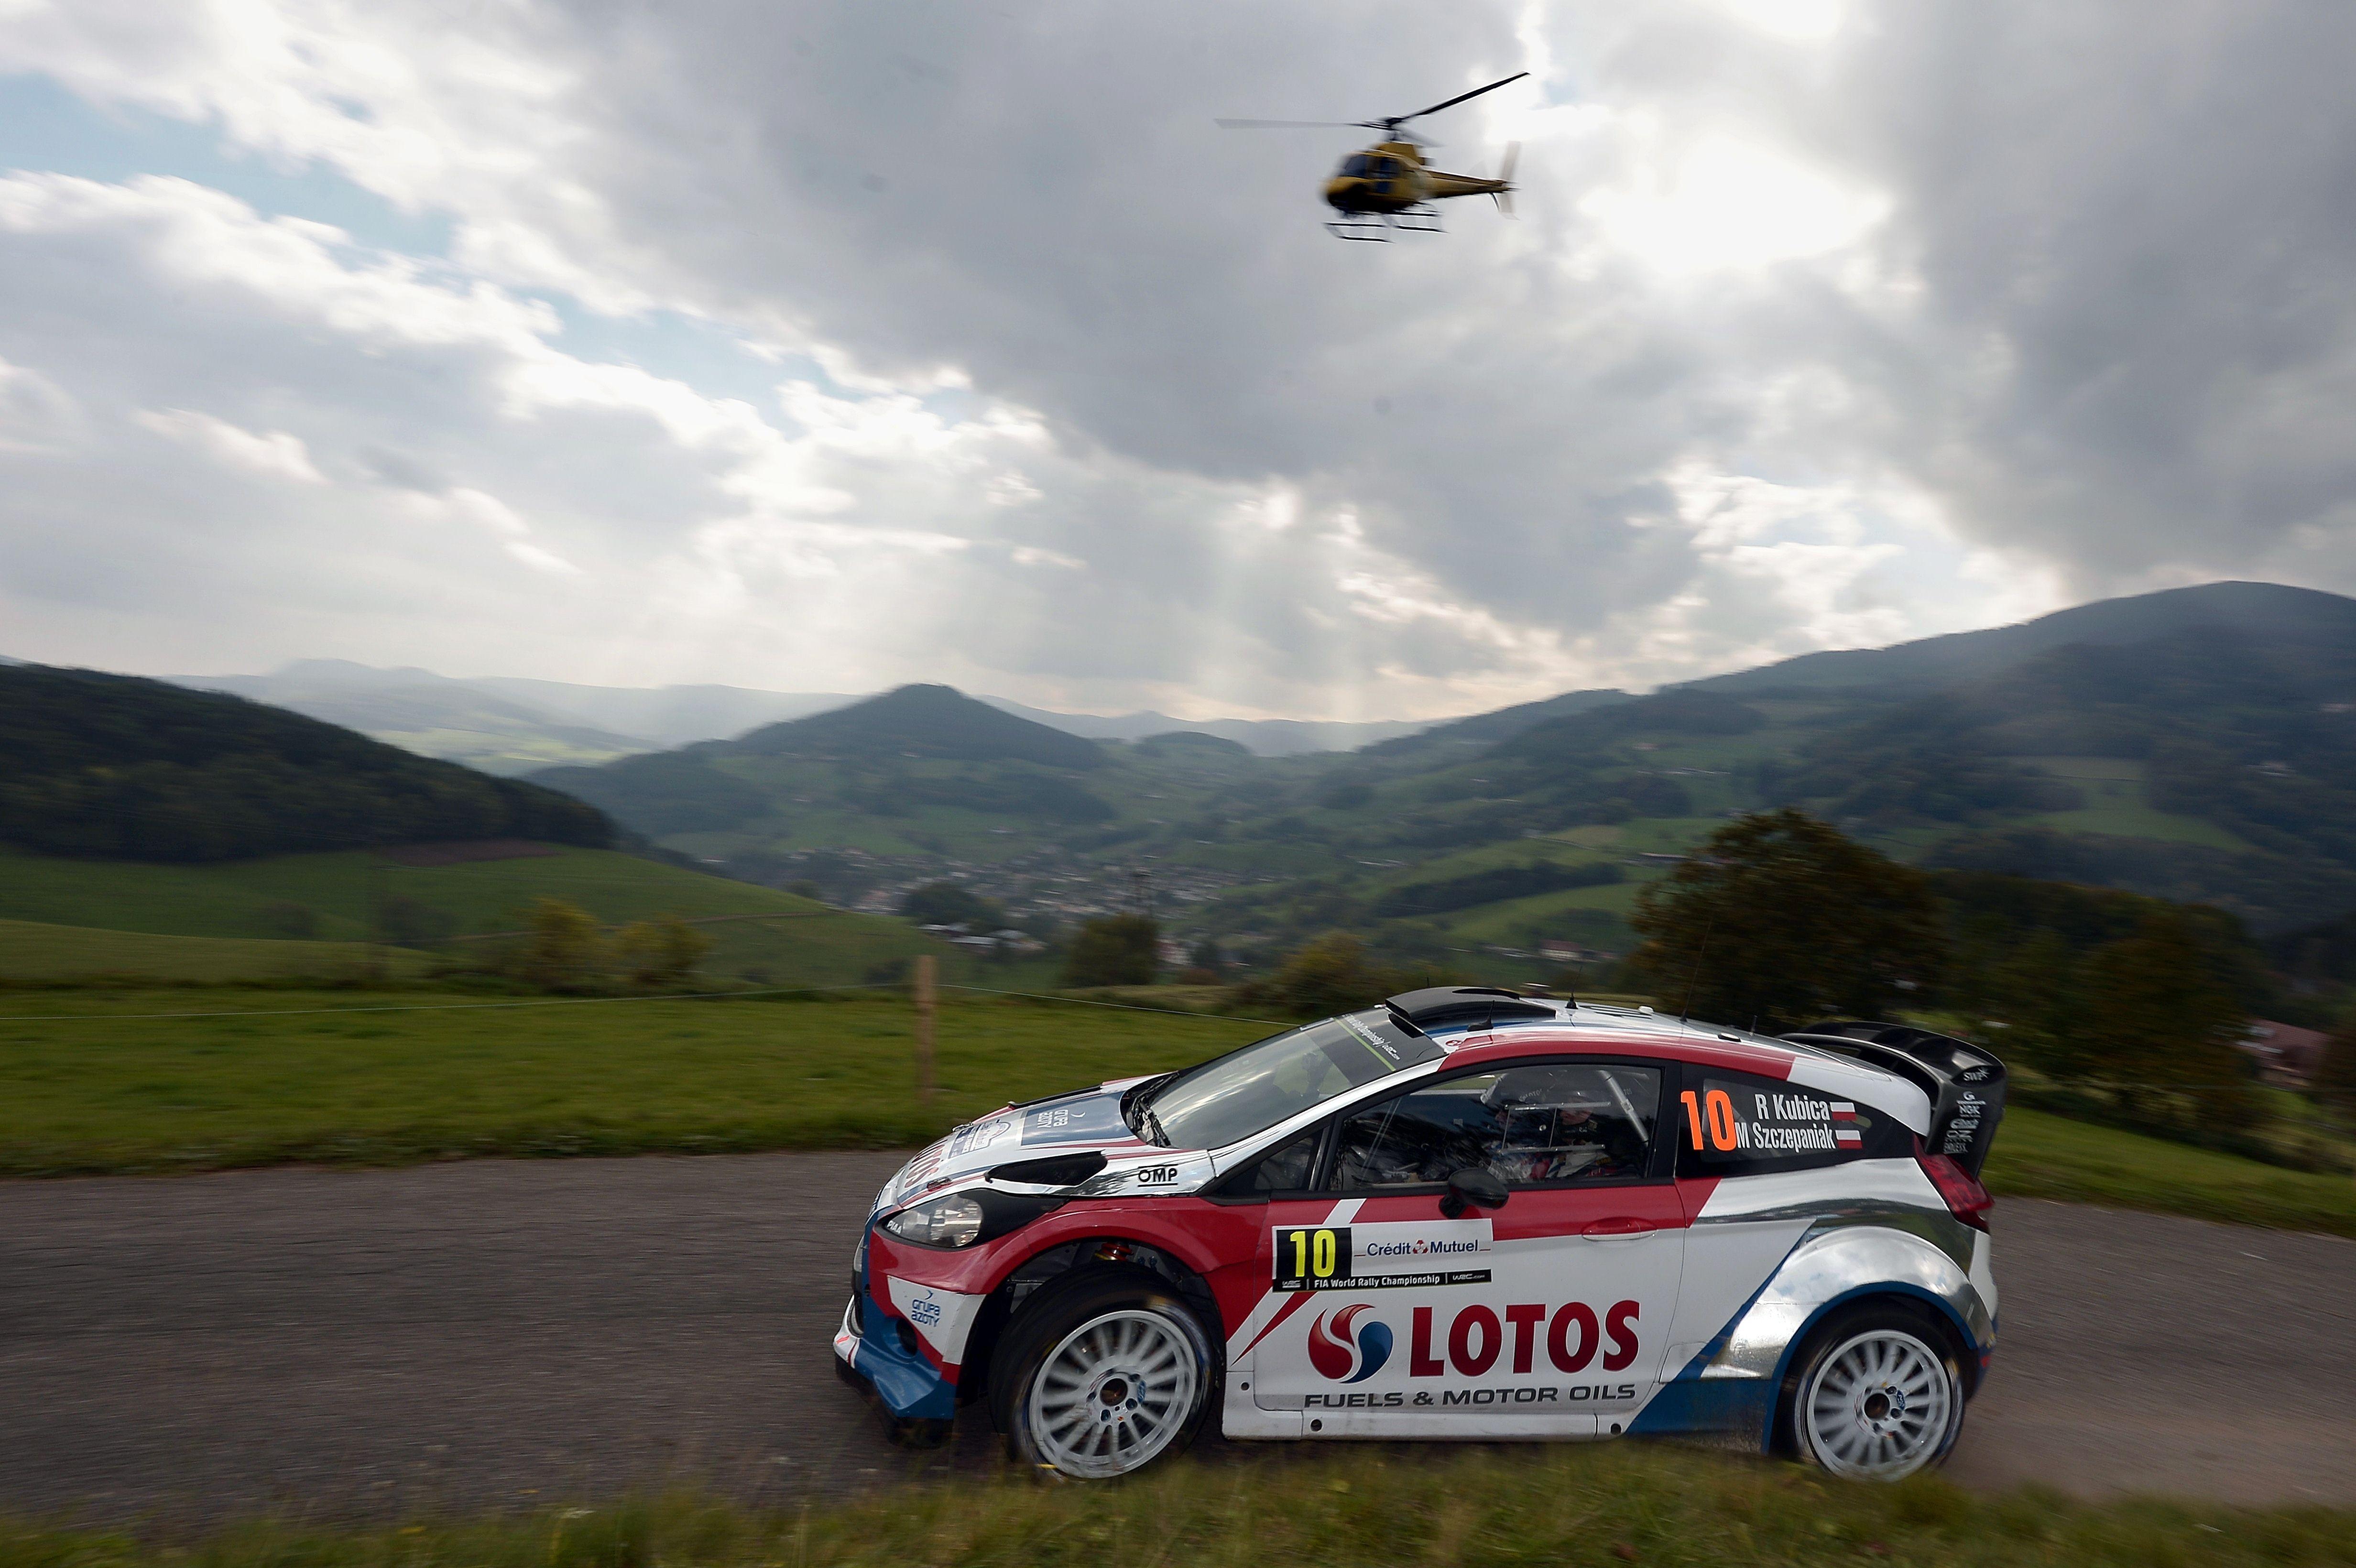 Wallpaper : sports, race cars, vehicle, Formula 1, rally cars ...